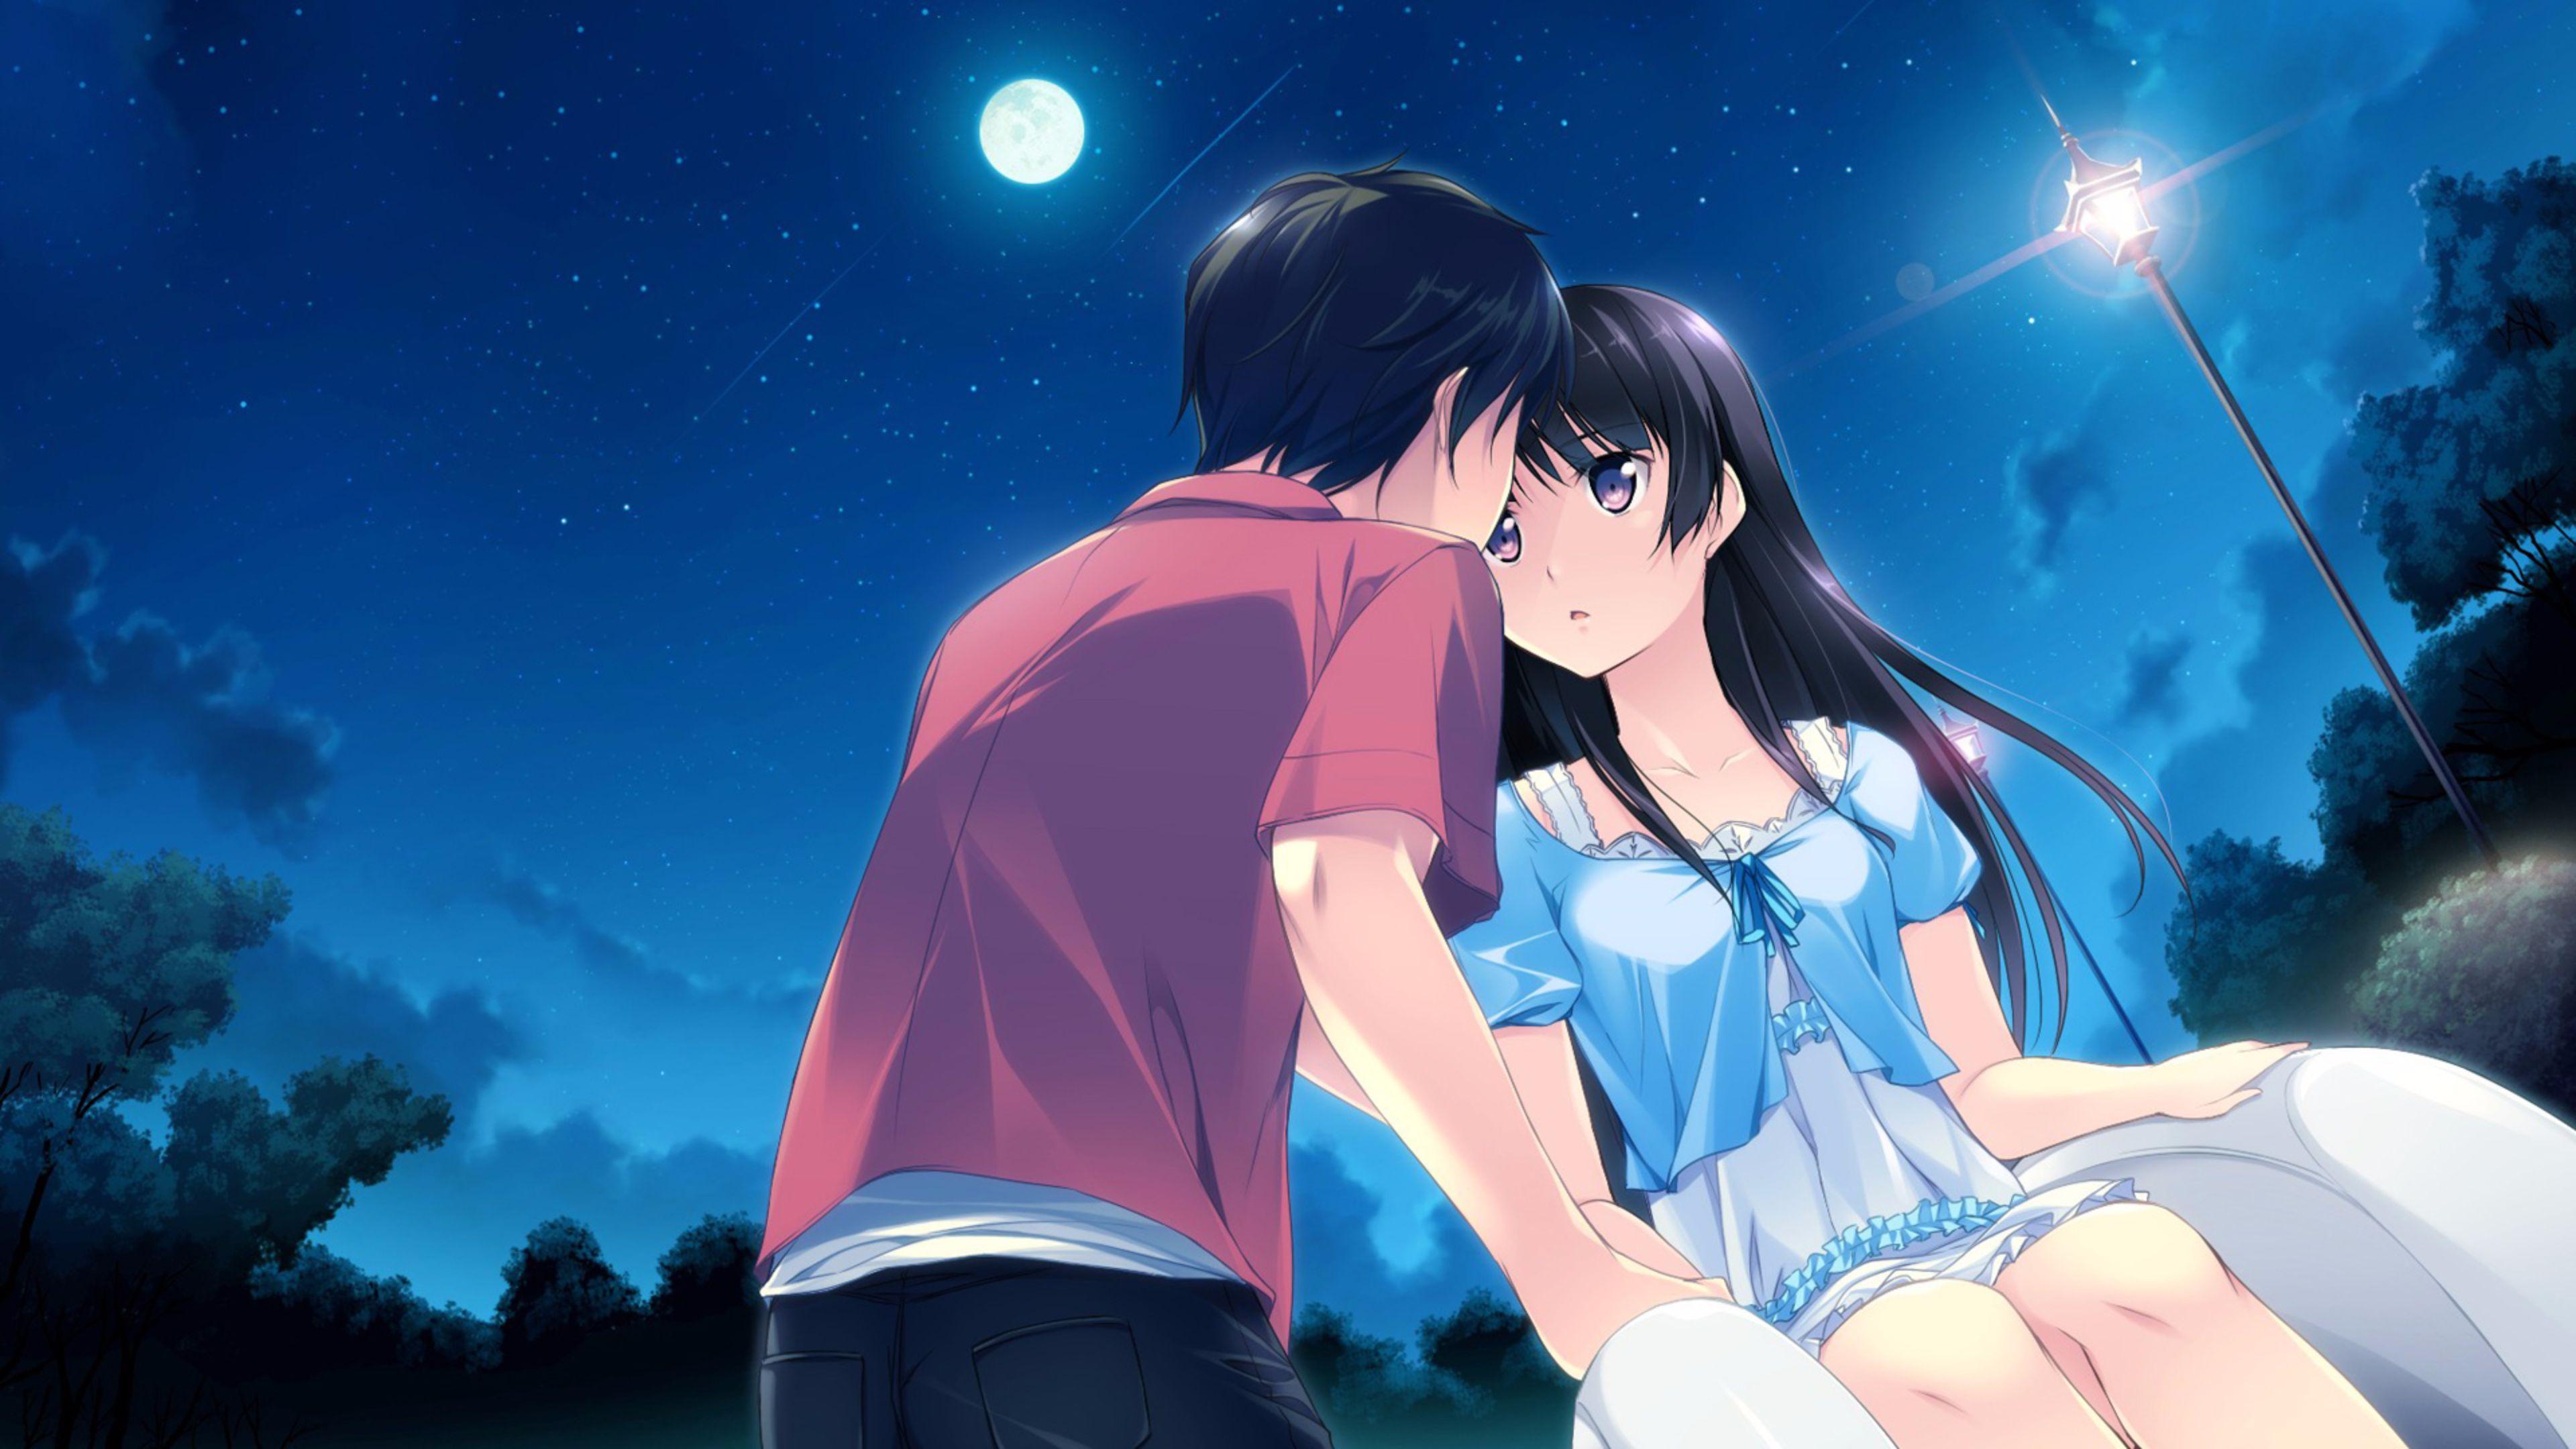 3d Love Couple Animated Hd Pictures Wallpapers: أجمل الصور خلفيات انمي رومانسية